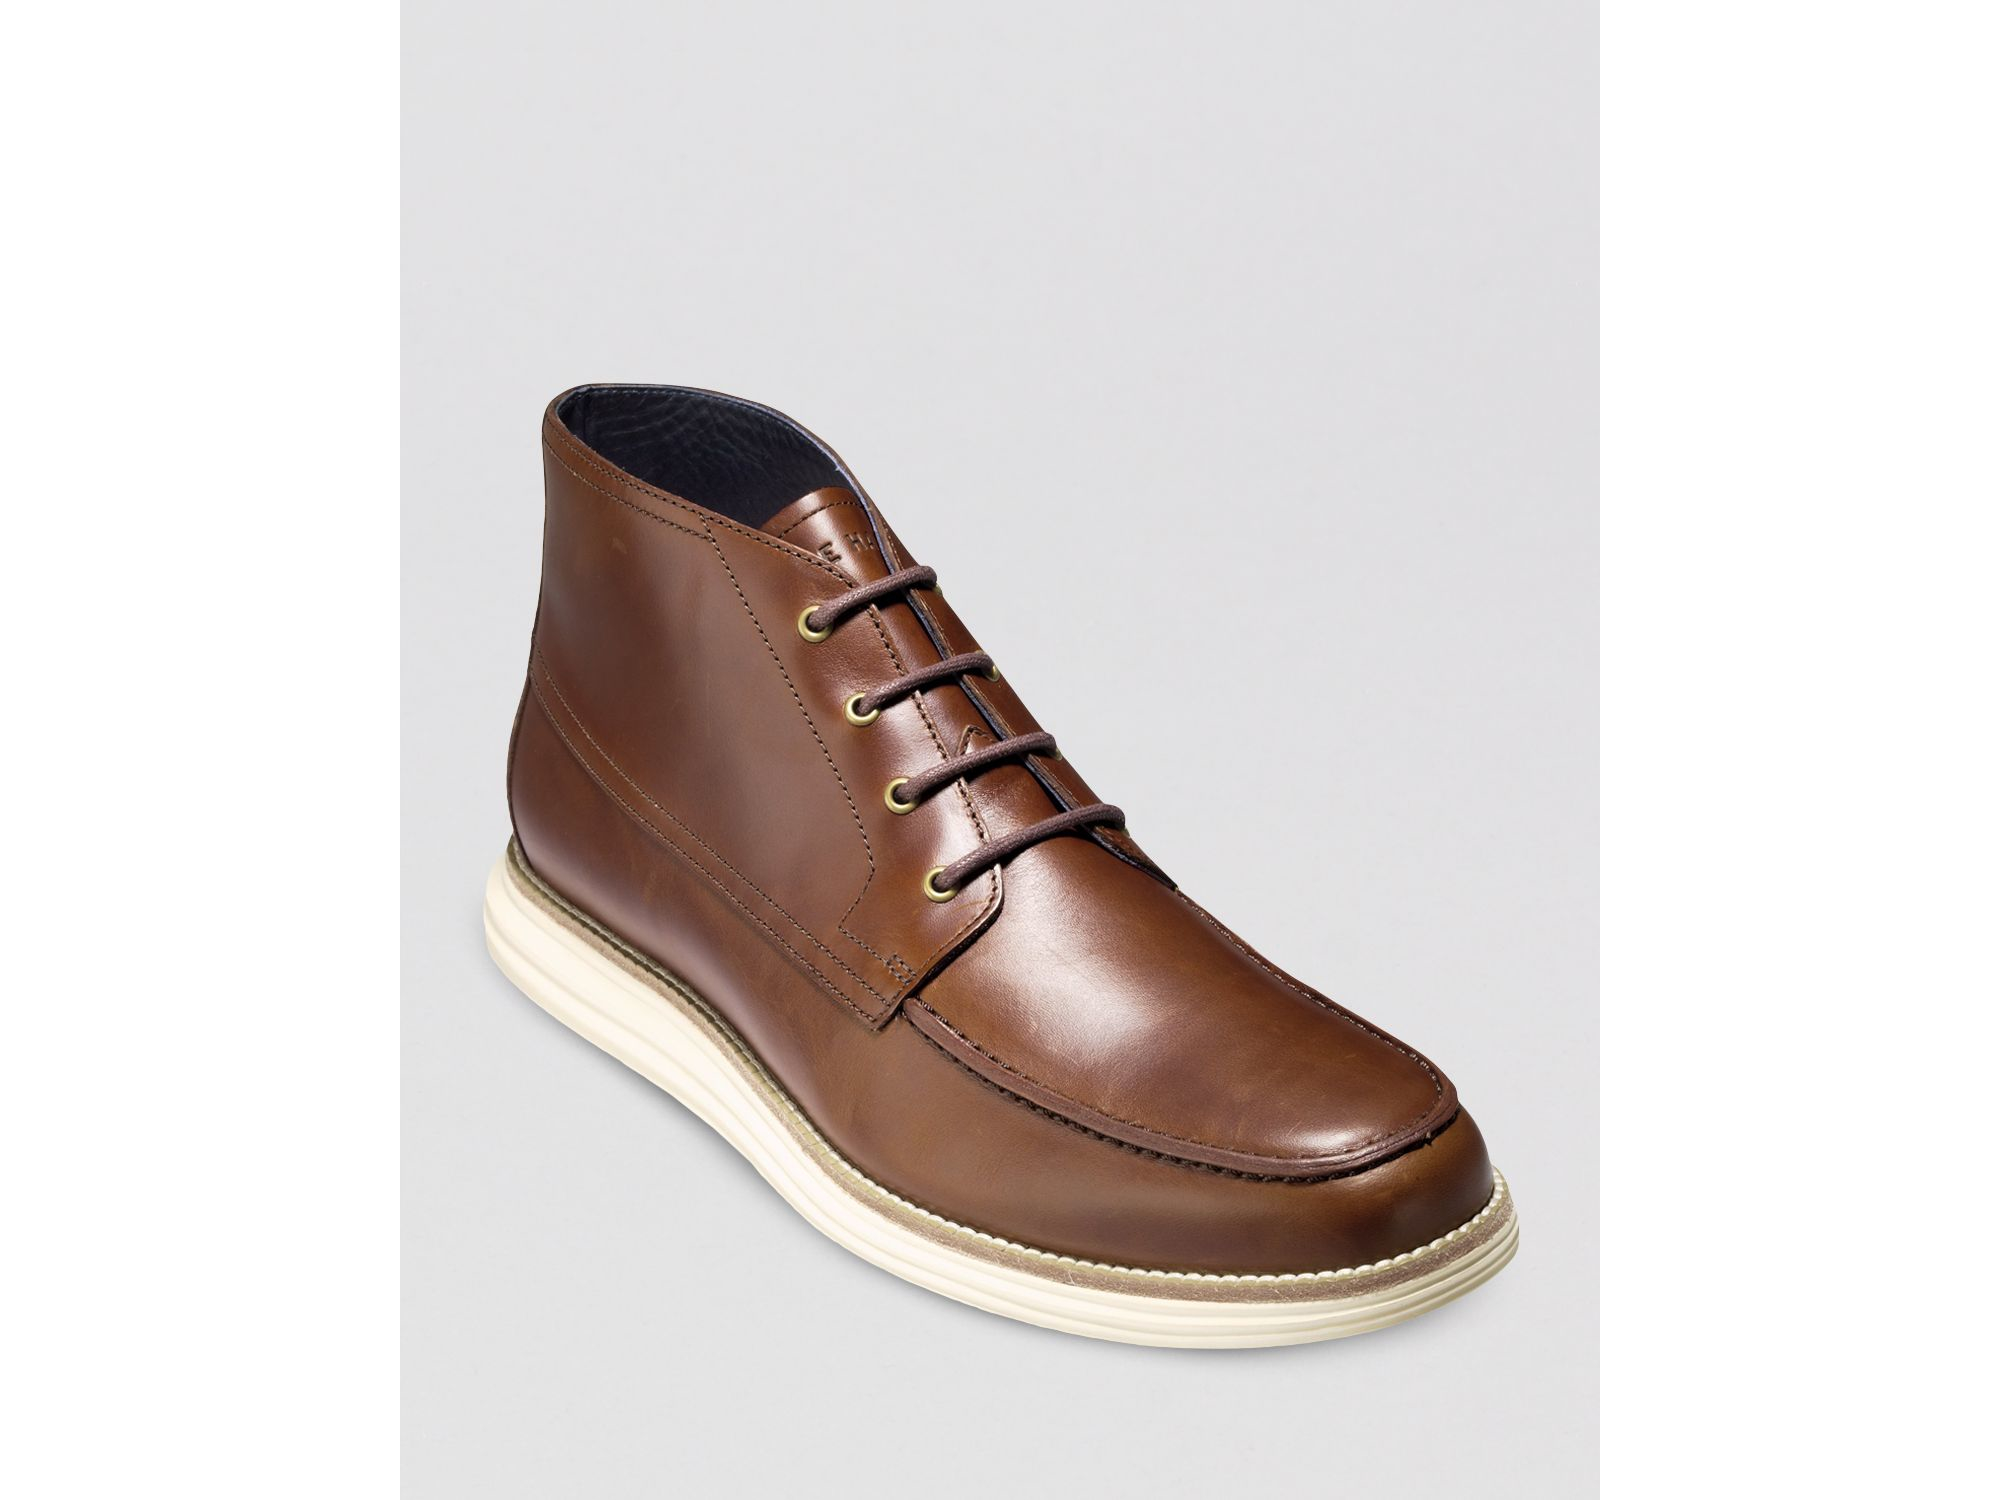 Cole Haan Lunargrand Moc Chukka Boots